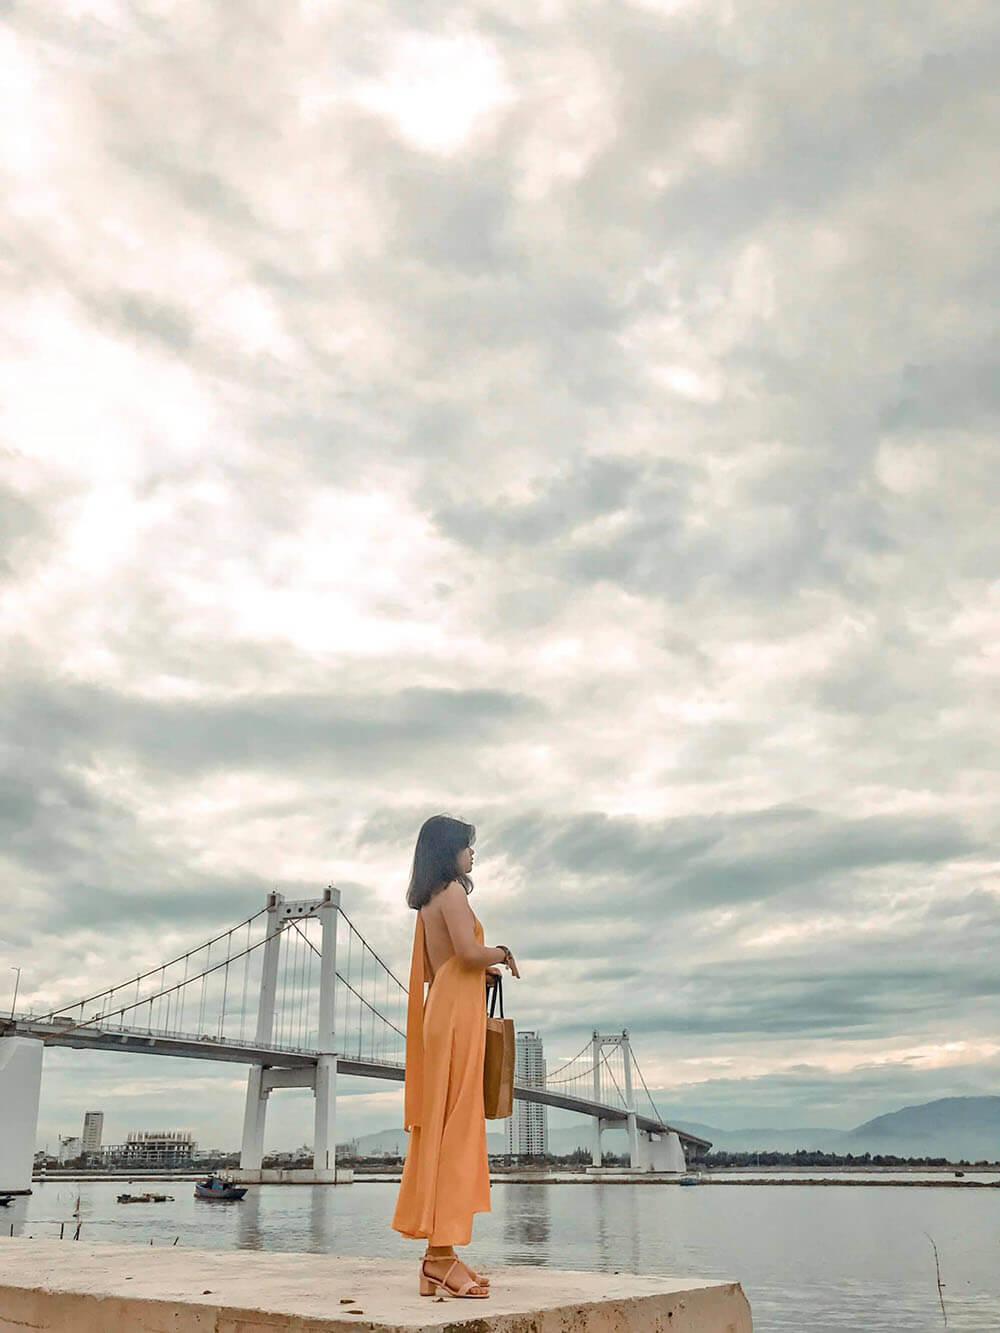 Danang Golden Bay Review Chuyen Du Lich Hoi An Da Nang Chanh Sa 3n2d 01